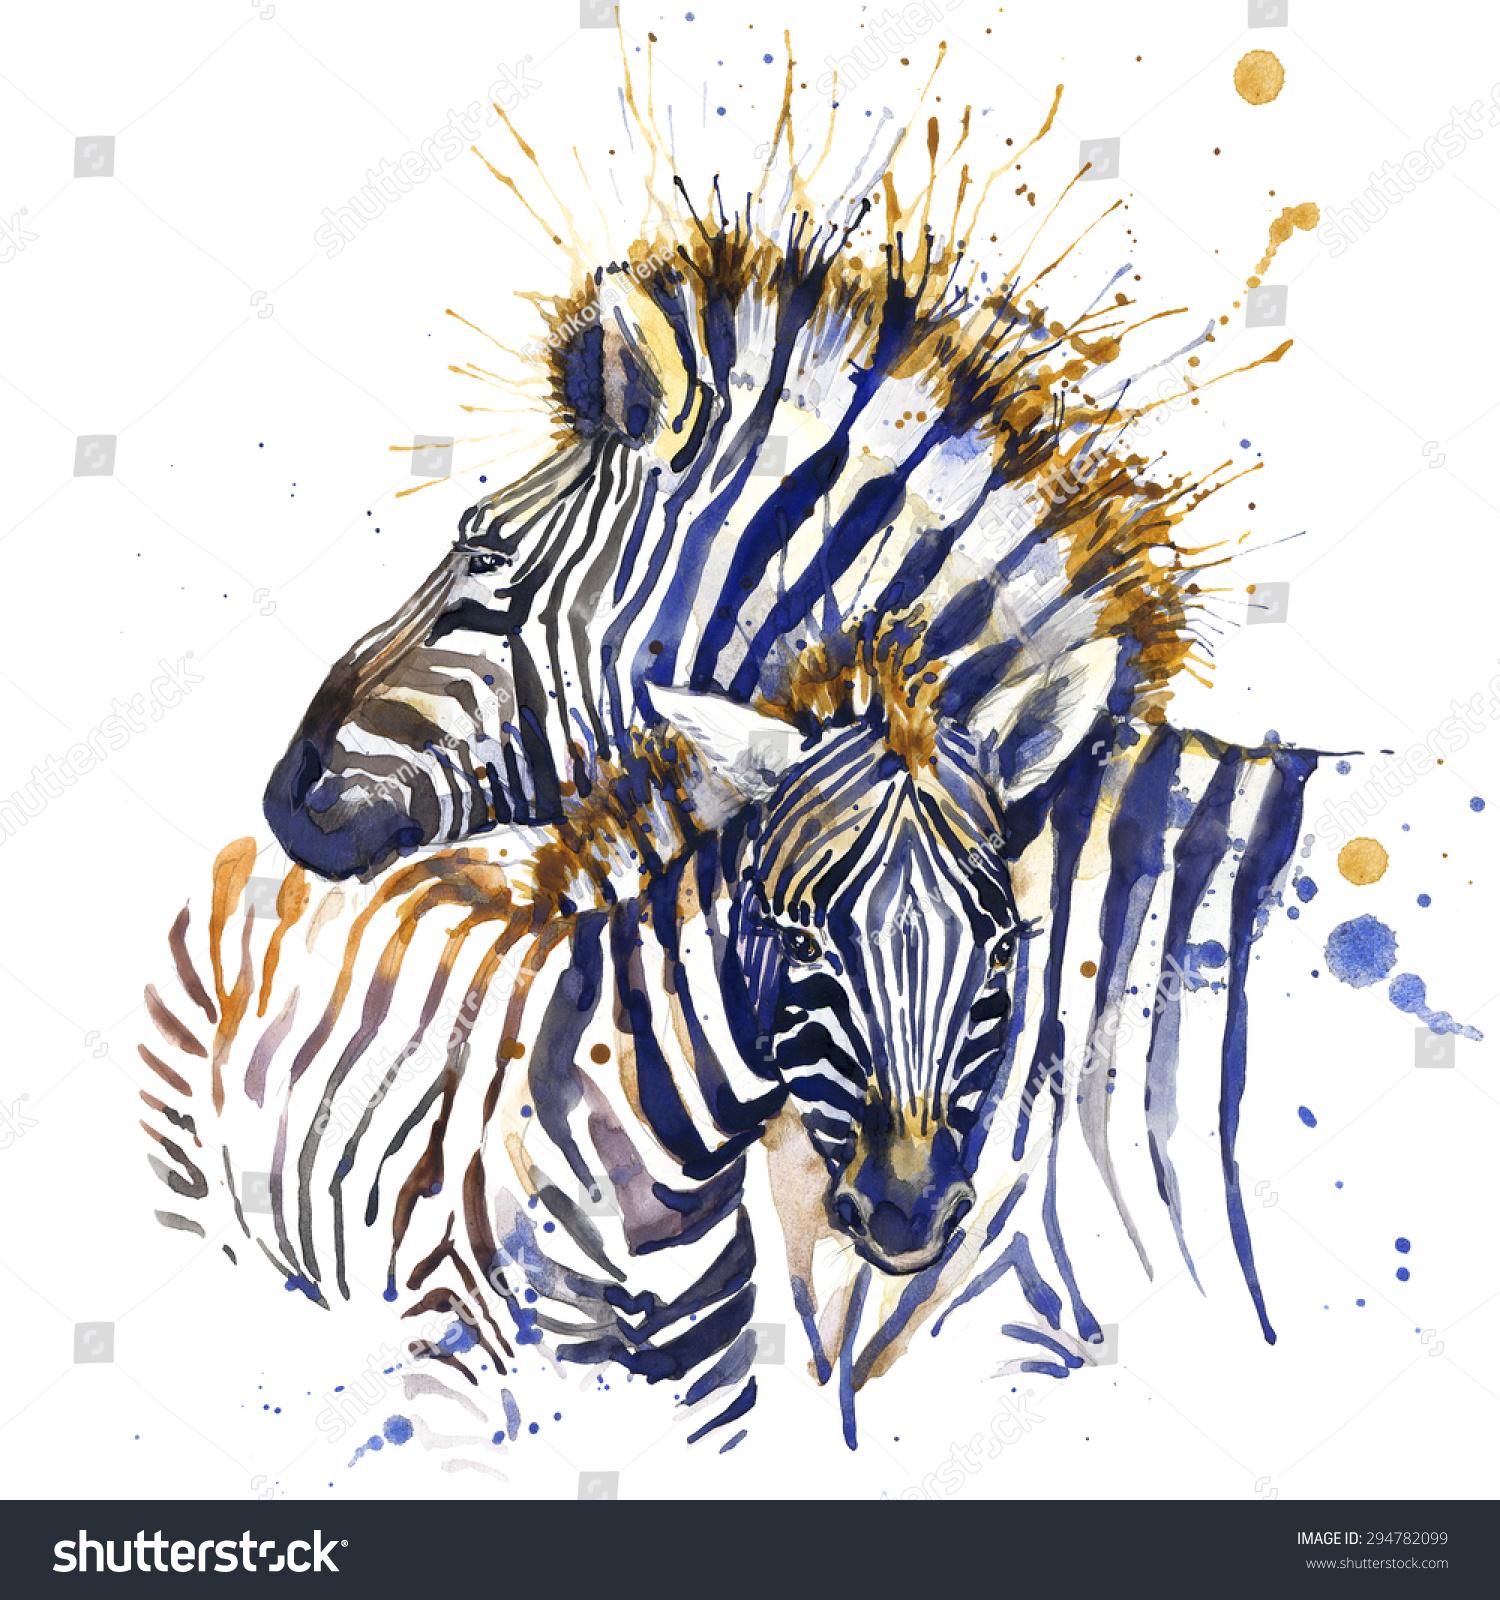 Zebra shirt design - Zebra T Shirt Graphics Zebra Illustration With Splash Watercolor Textured Background Unusual Illustration